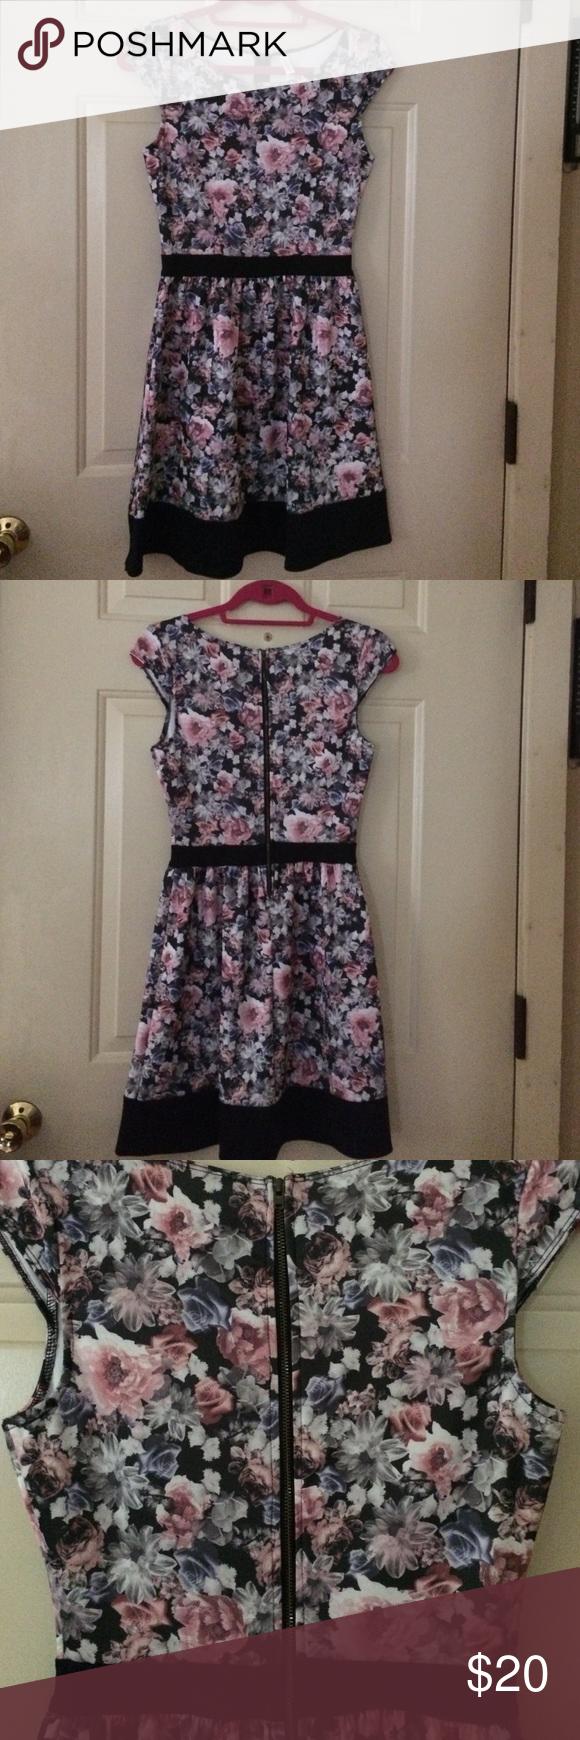 Nwot Floral Dress Floral Dress Dresses Clothes Design [ 1740 x 580 Pixel ]